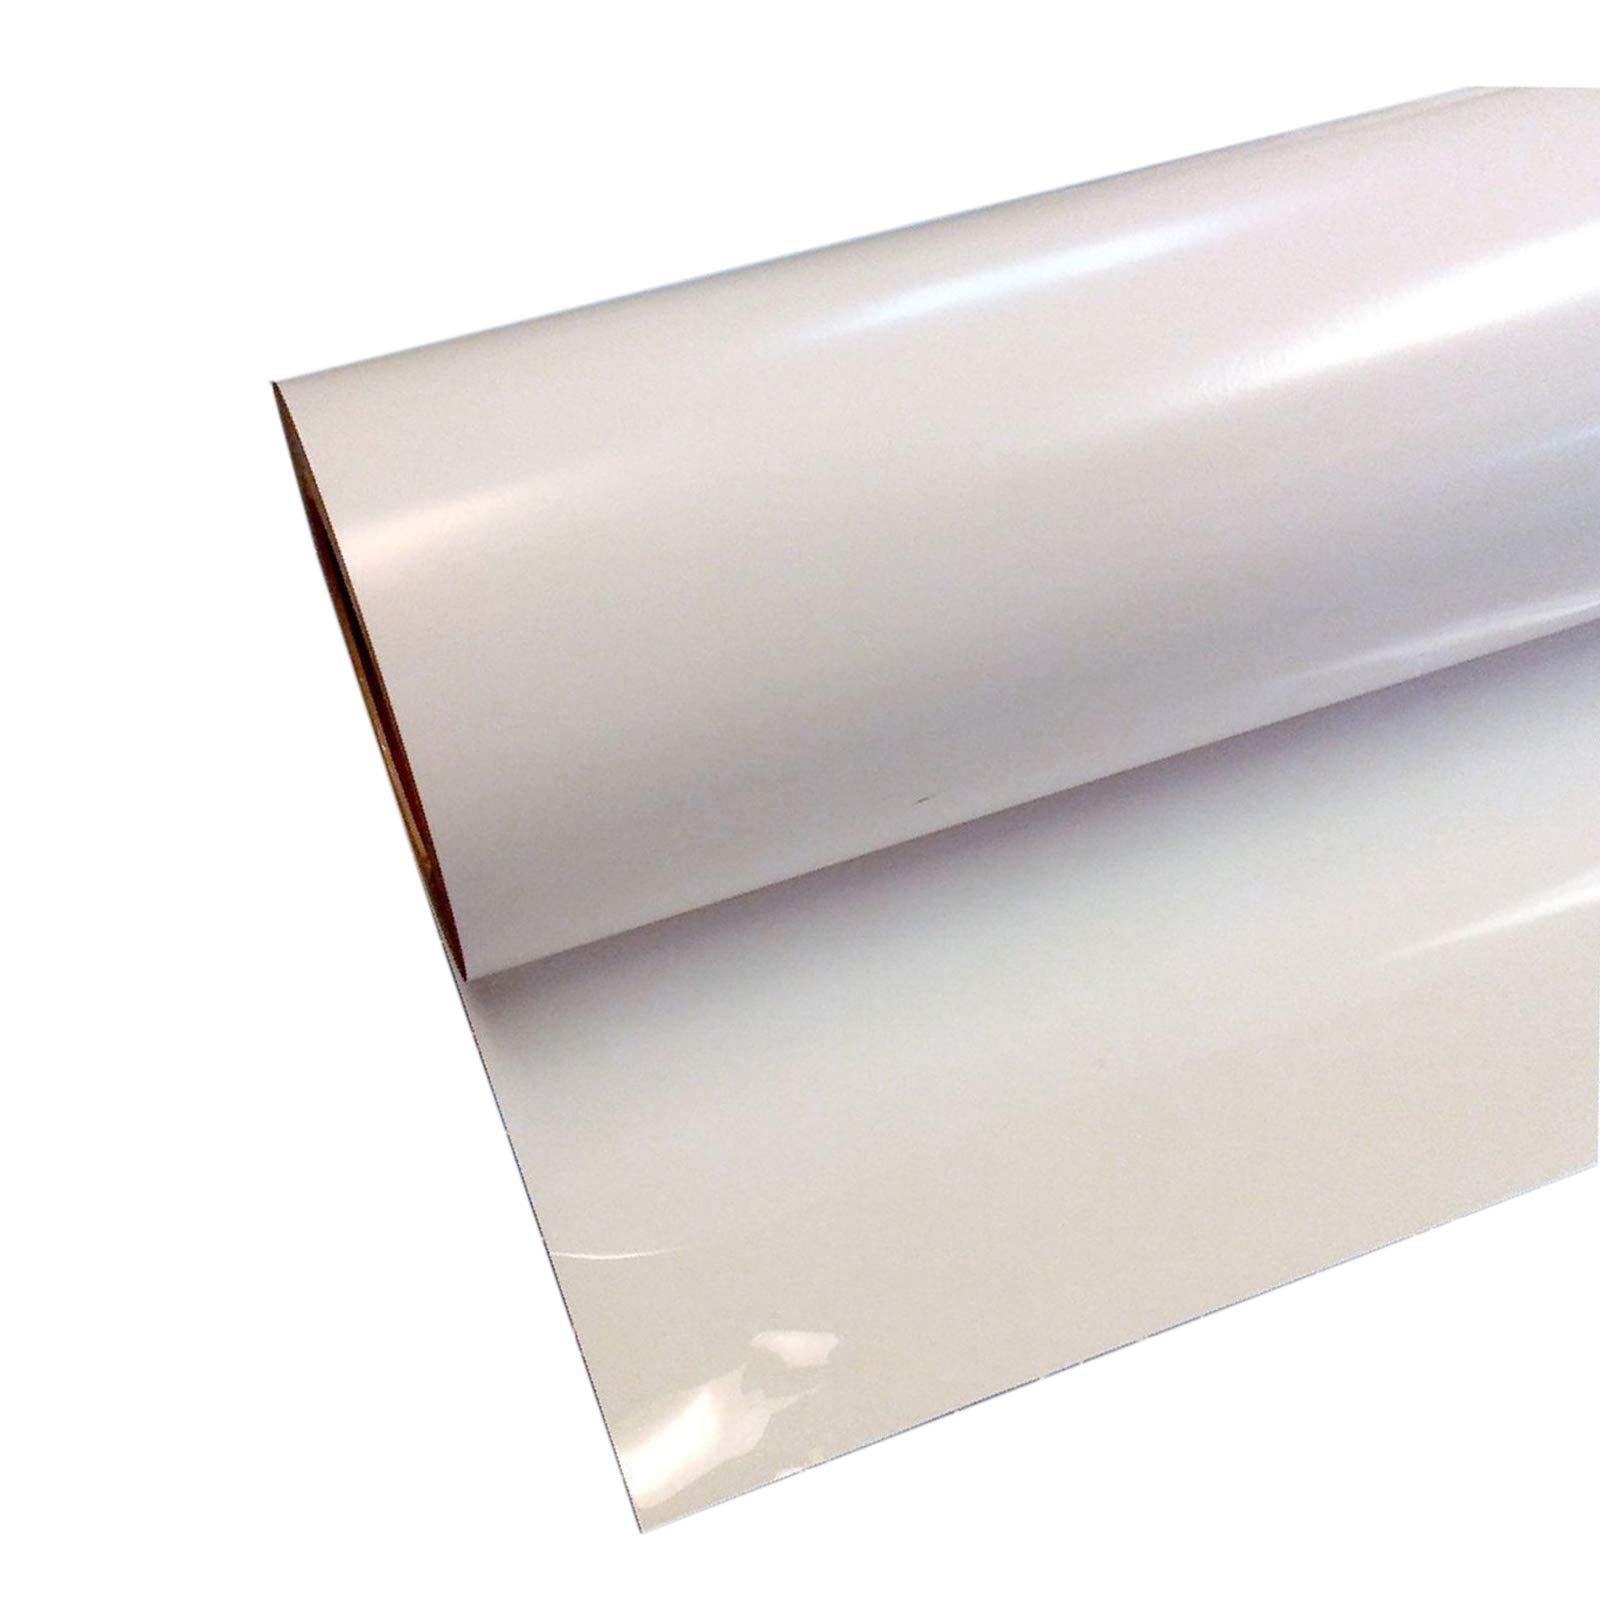 "POVOKICI PU Heat Transfer Vinyl 19.7"" x 82´ Roll Non-Sticky Digital Cutting Heat Transfer Vinyl(White)"